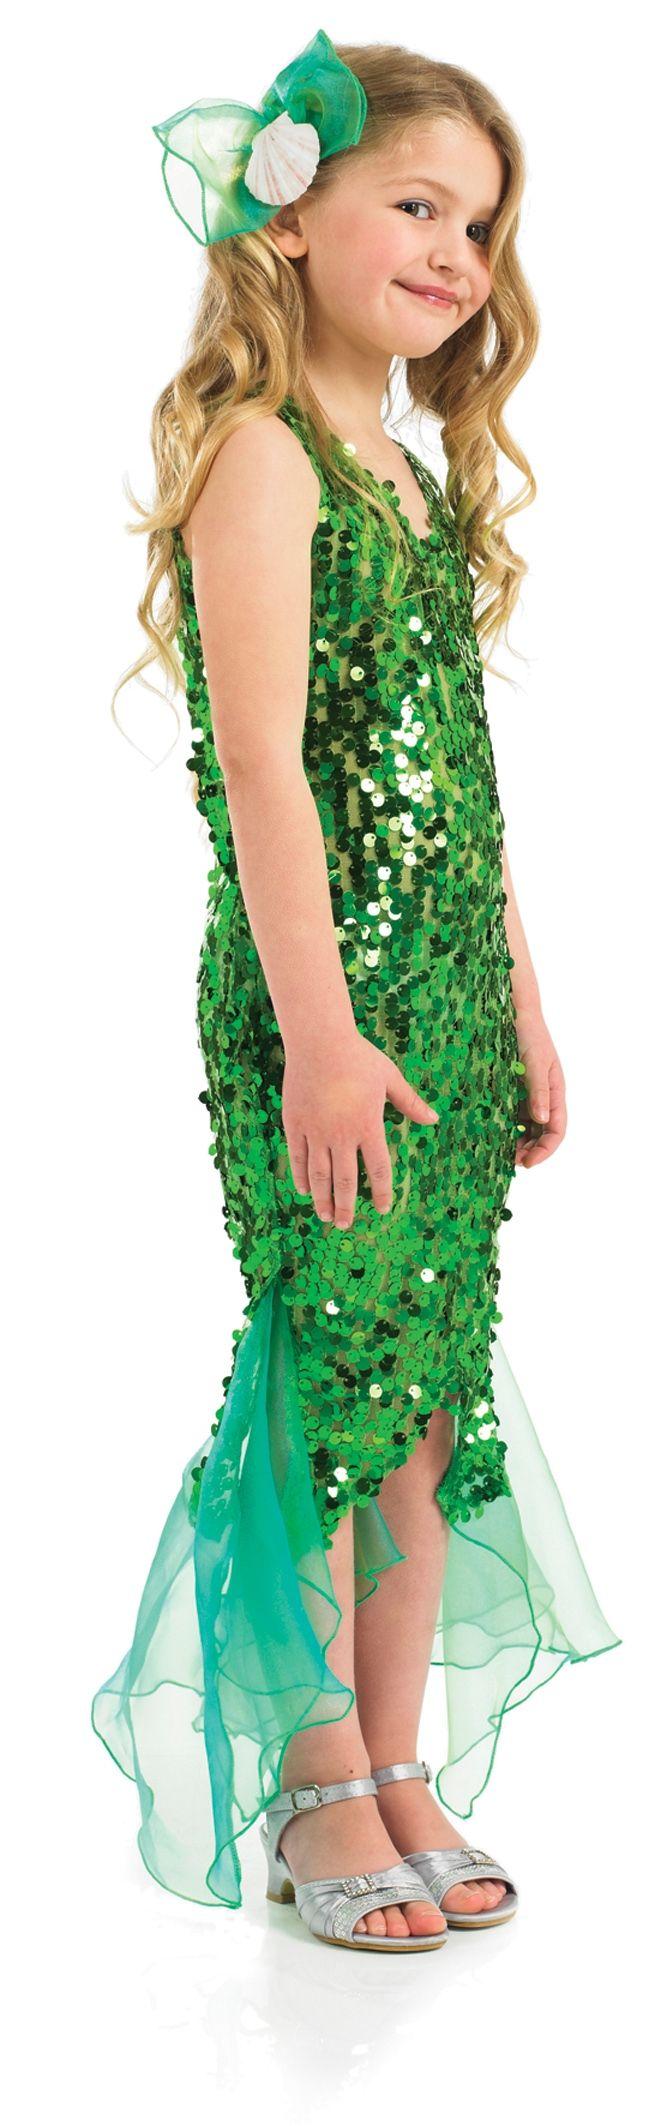 Details about Little Mermaid Girls Fancy Dress Green Sequin Ariel ...